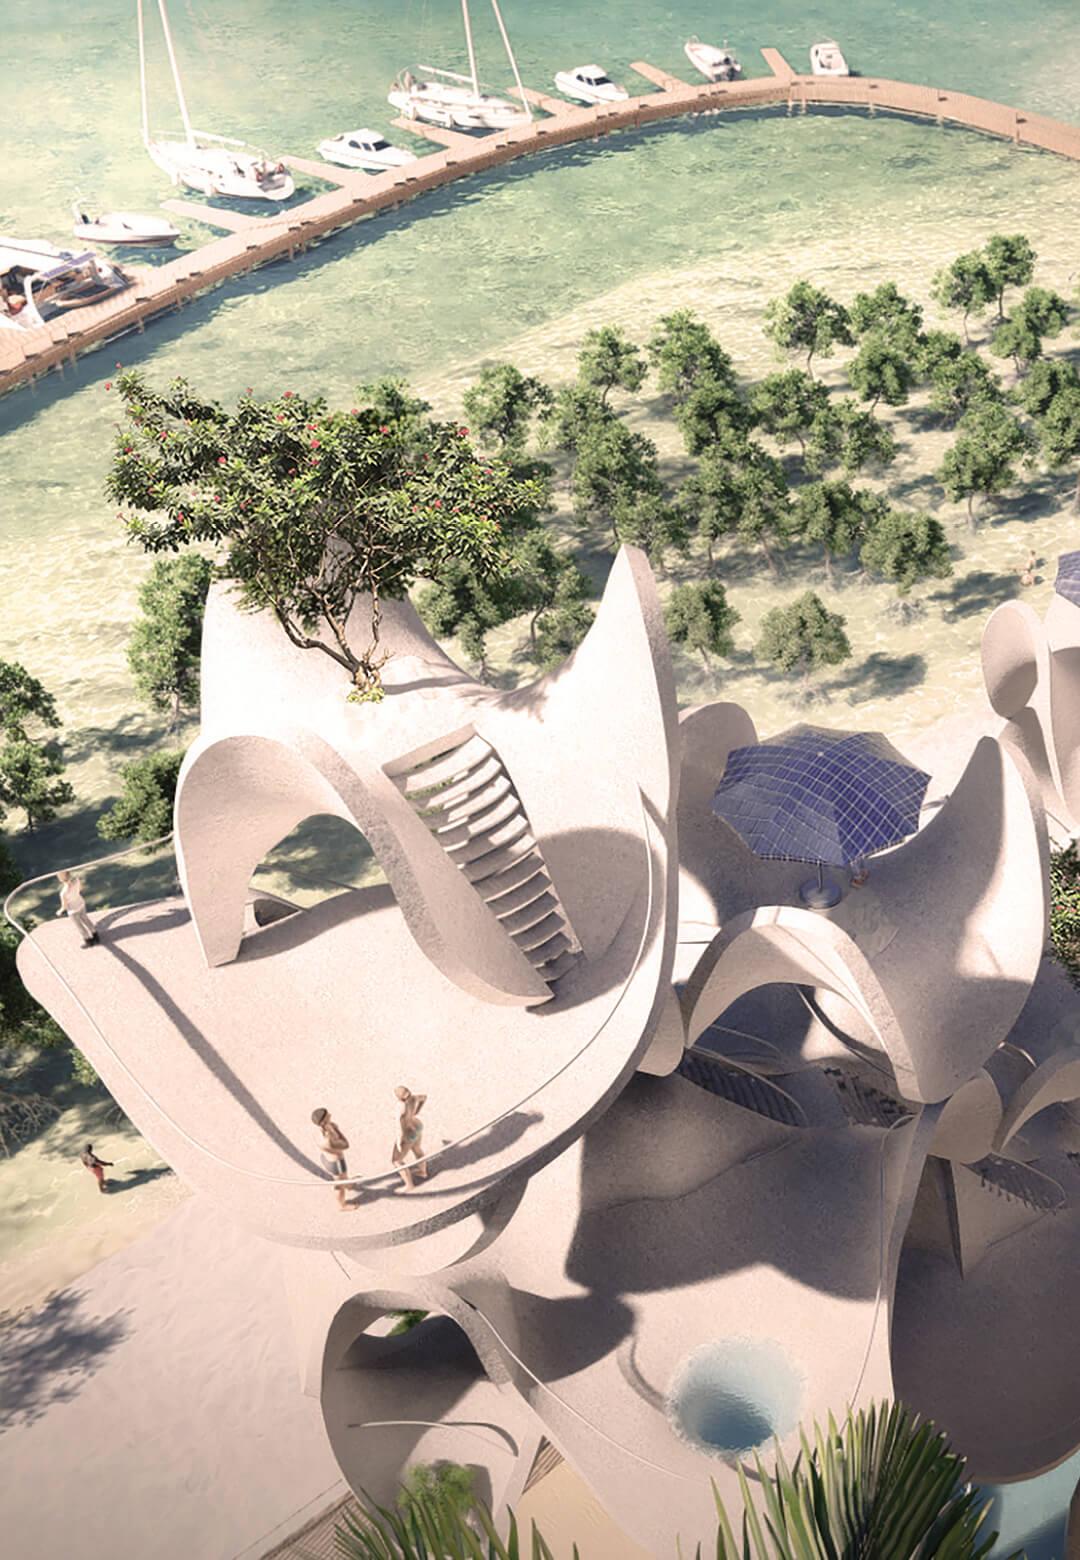 Cagbalete Sand Clusters by Carlo Calma Consultancy | Cagbalete Sand Clusters | Carlo Calma Consultancy Inc. | STIRworld